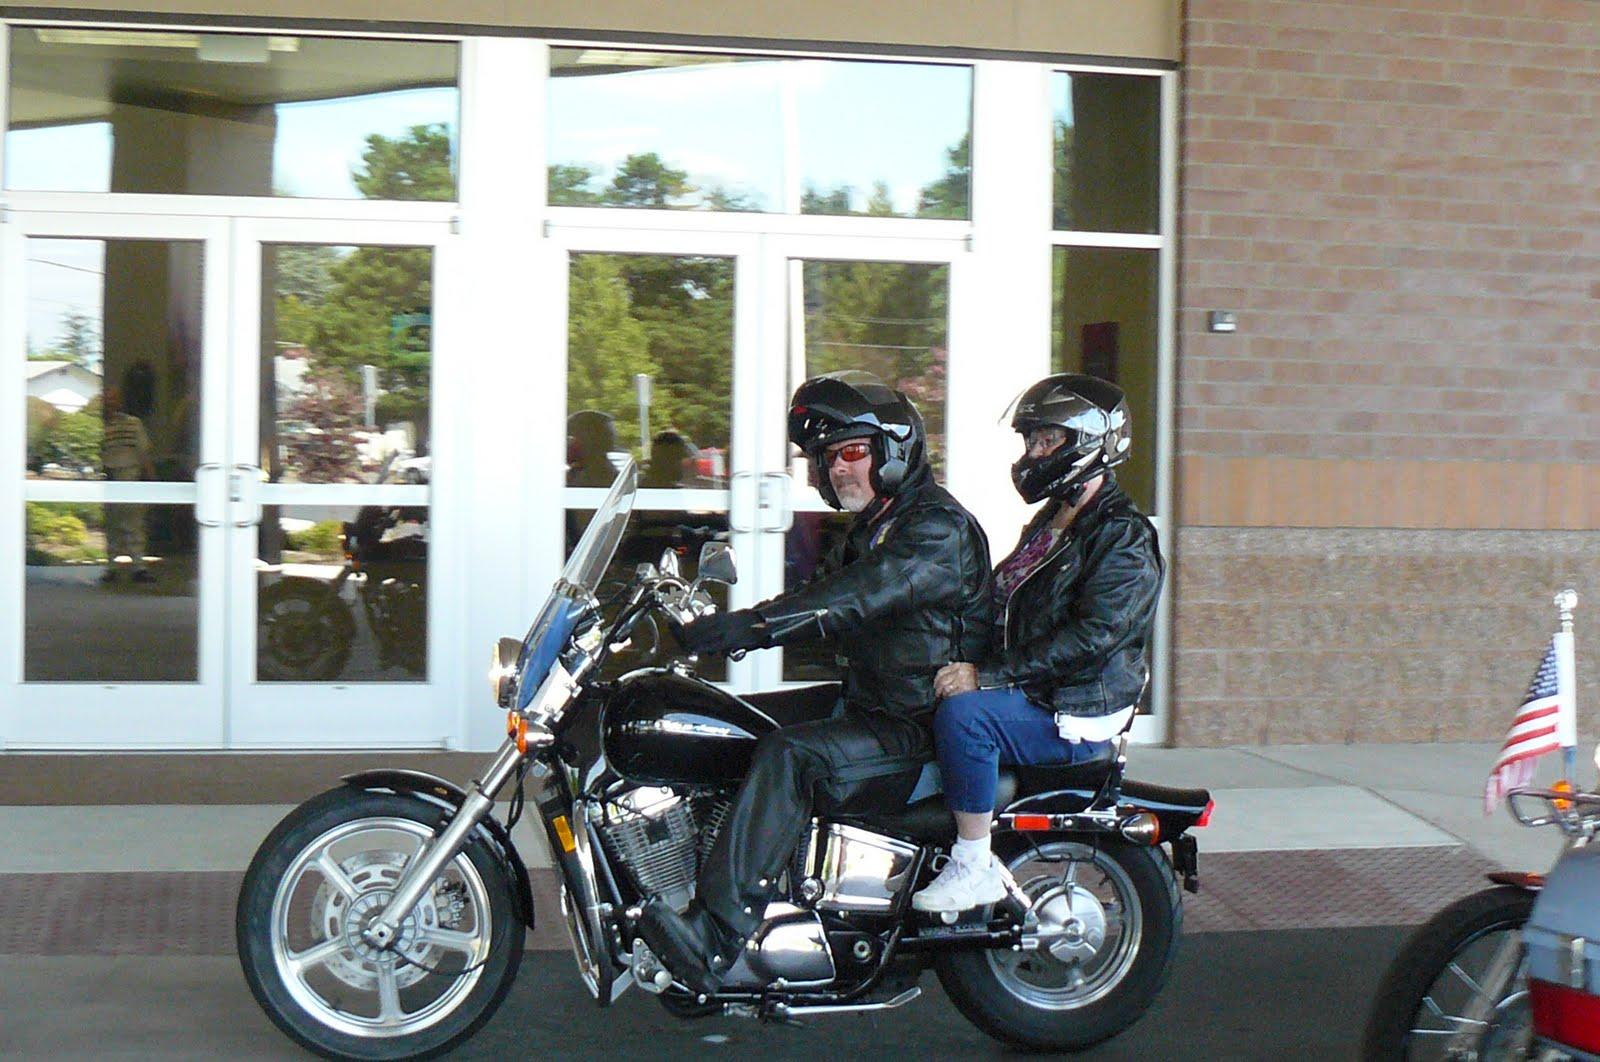 Yakkin with Flo: biker chick